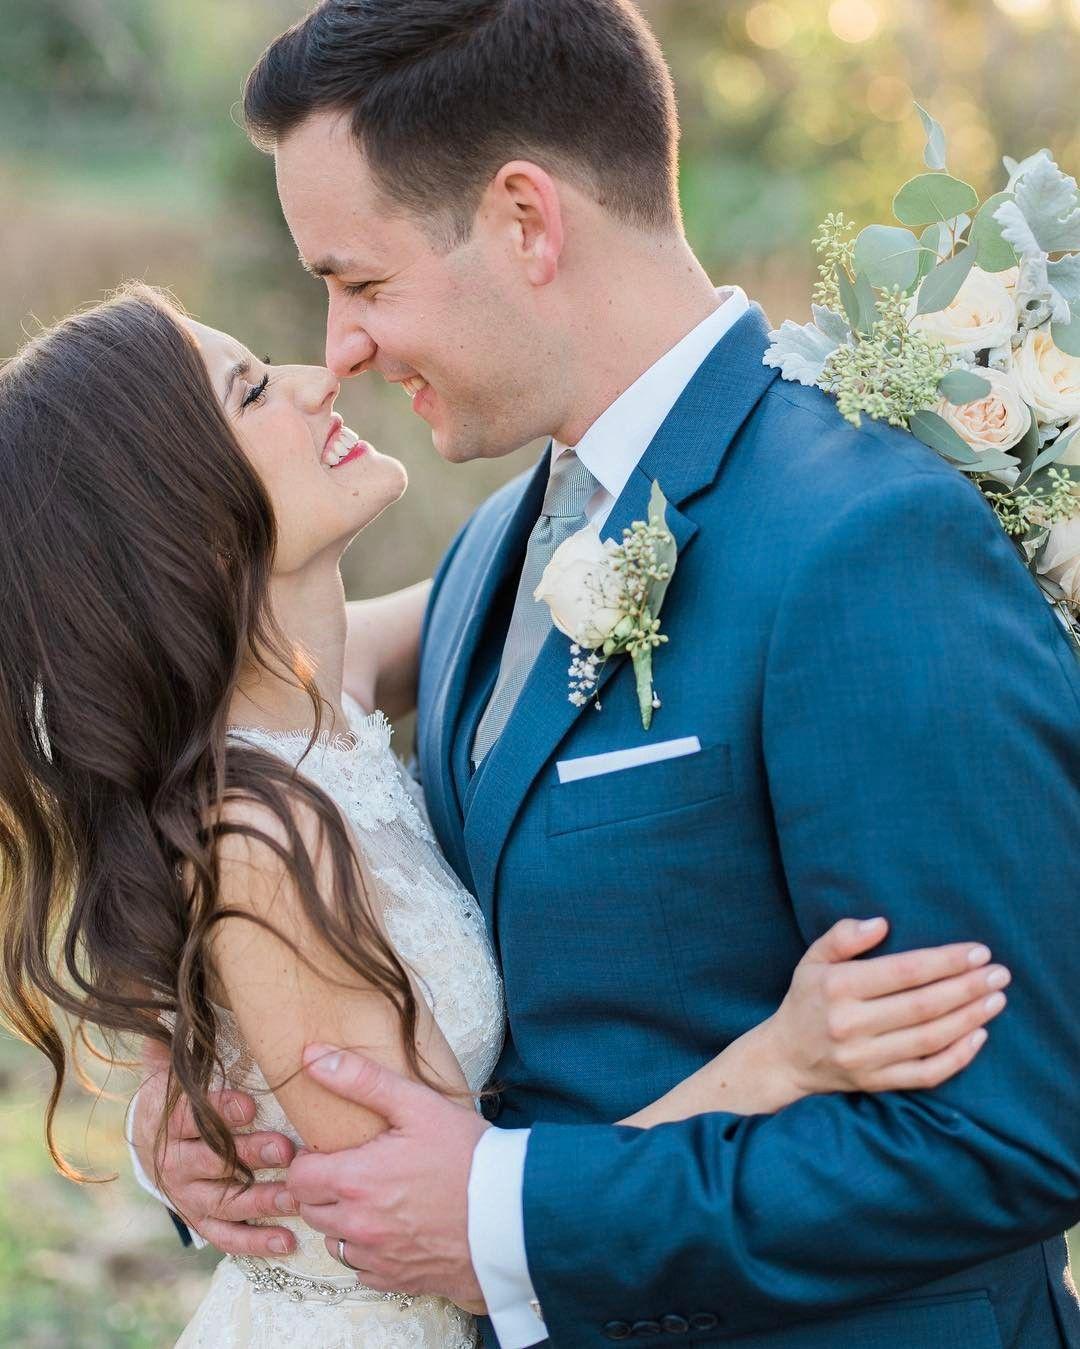 Wedding photography by @matthew.nigel edited with Mastin Labs film emulation presets for Adobe Lightroom.   #weddingphotography #filmphotography #lifestylephotography